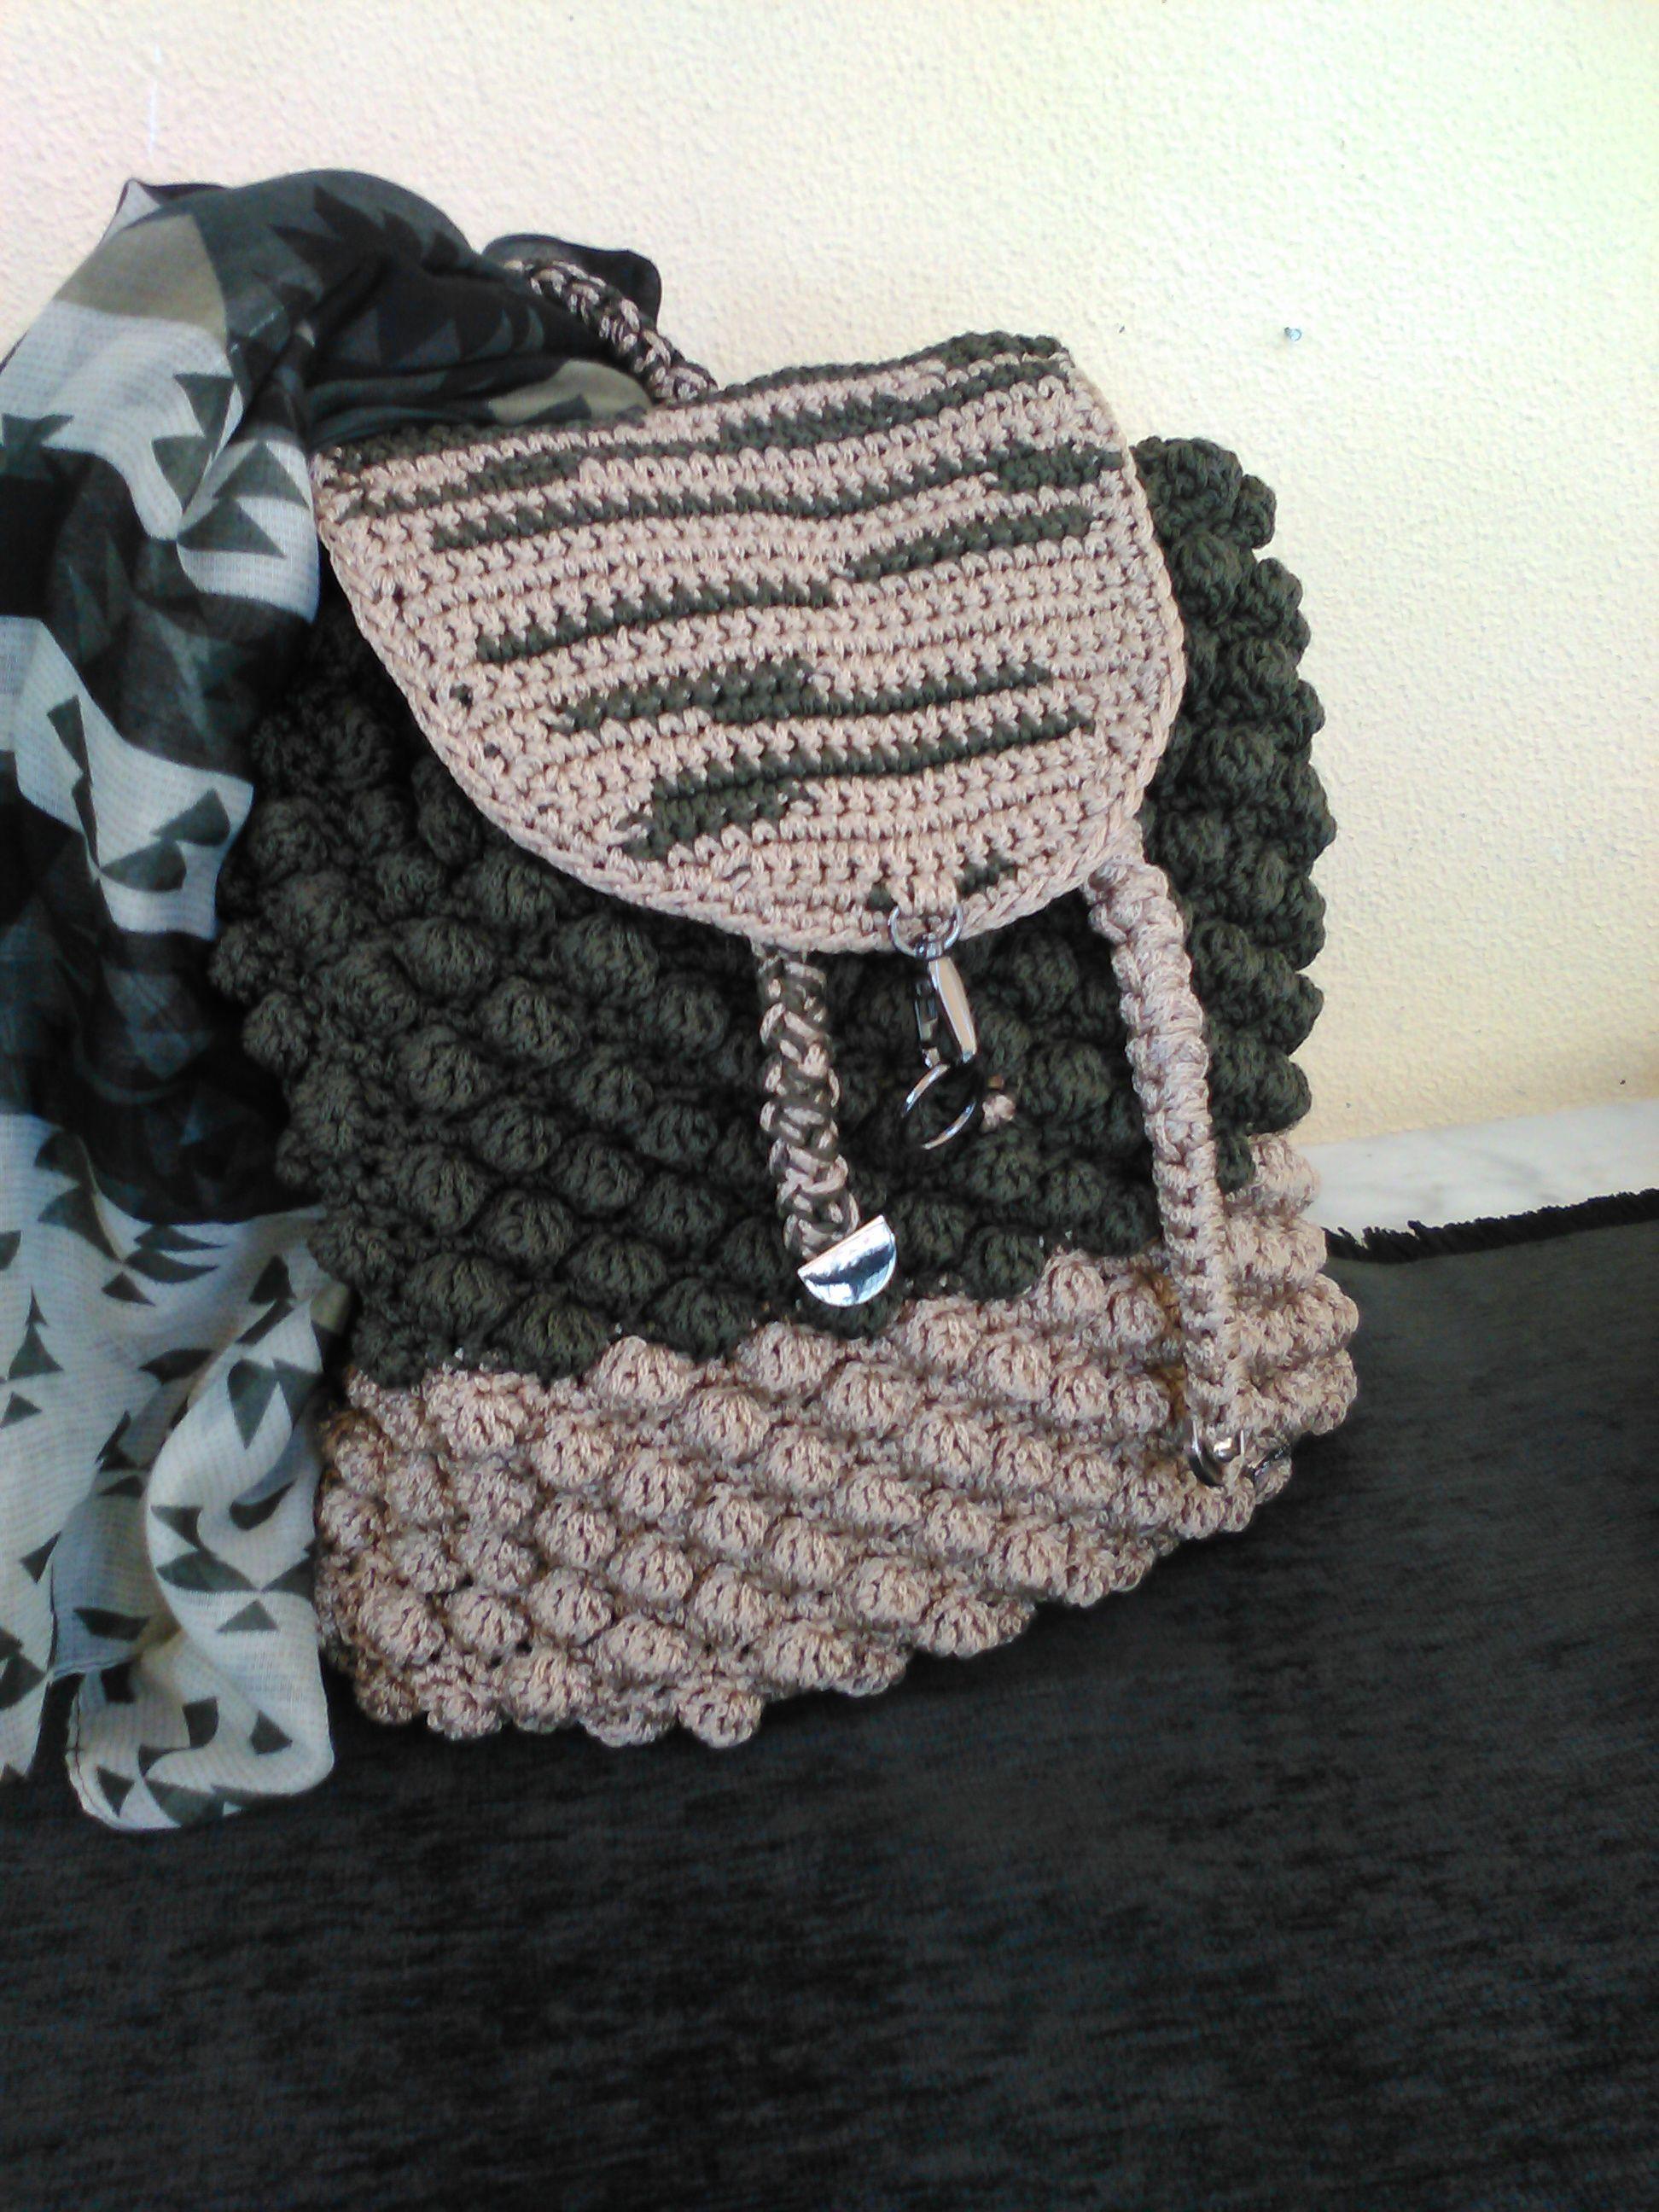 d690b337f9 Πλεκτή τσάντα - σακίδιο πλάτης